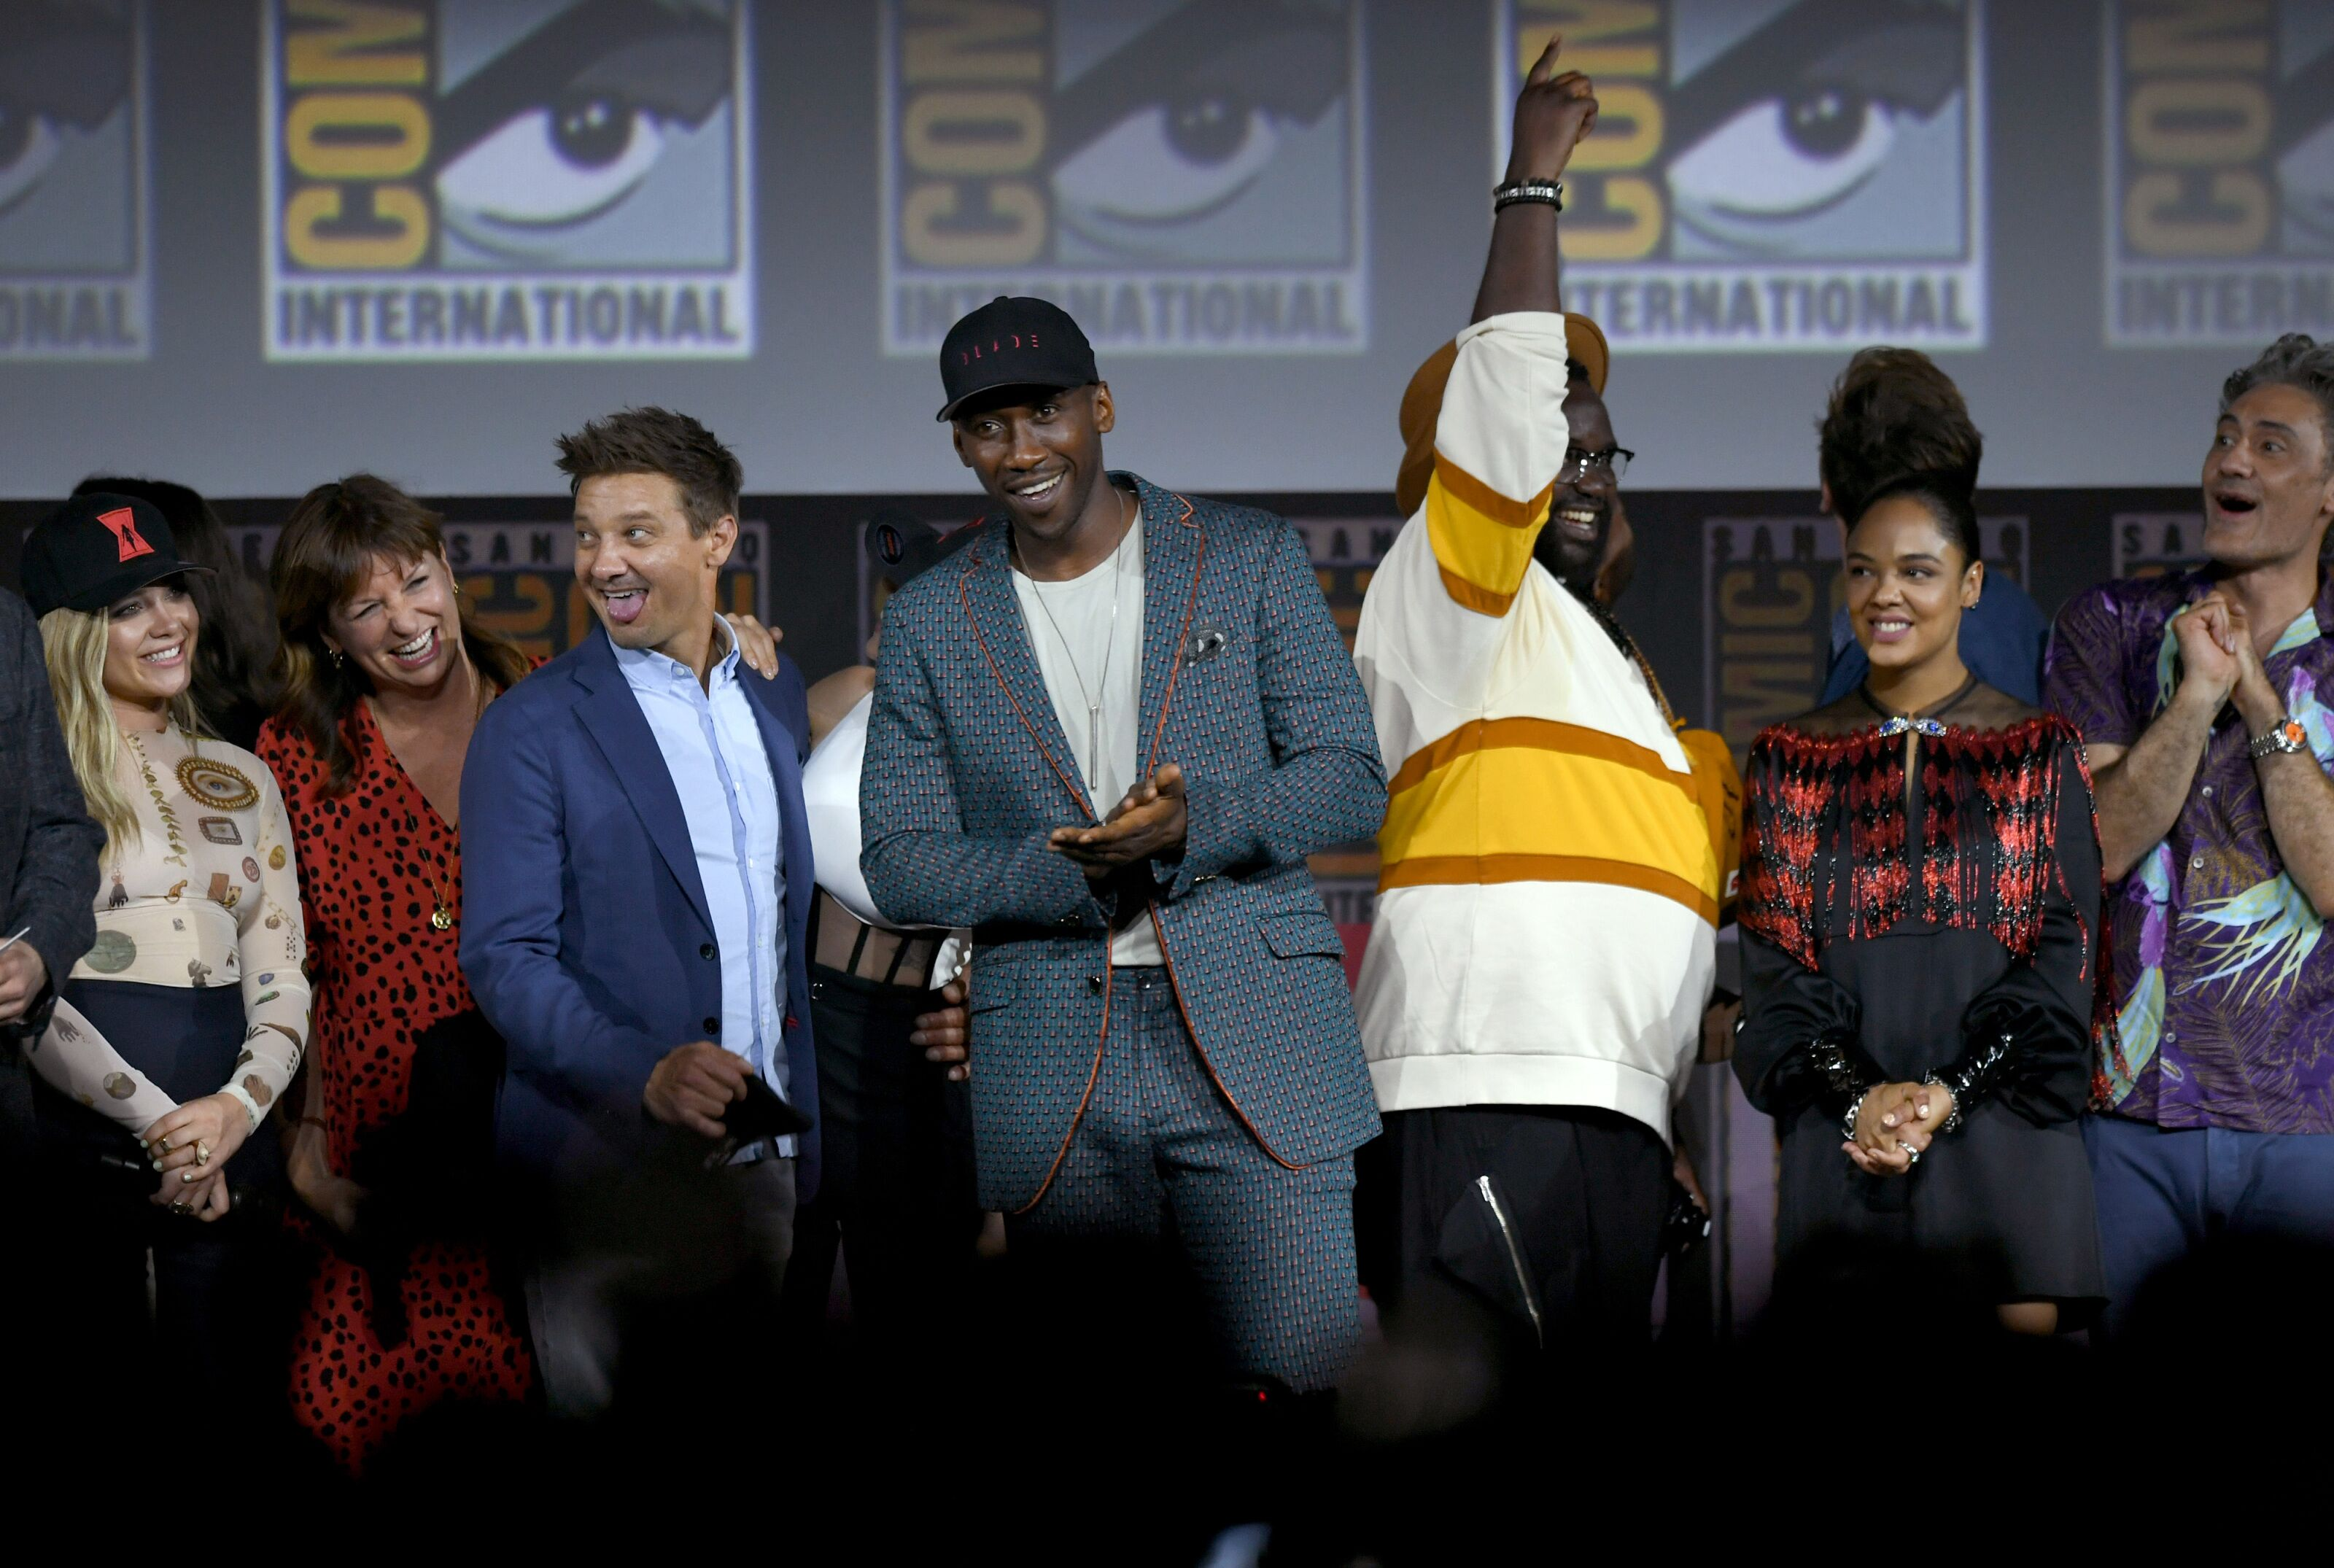 Hulu Originals: Star of Marvel Studios' Blade reboot set to cameo in Ramy Season 2